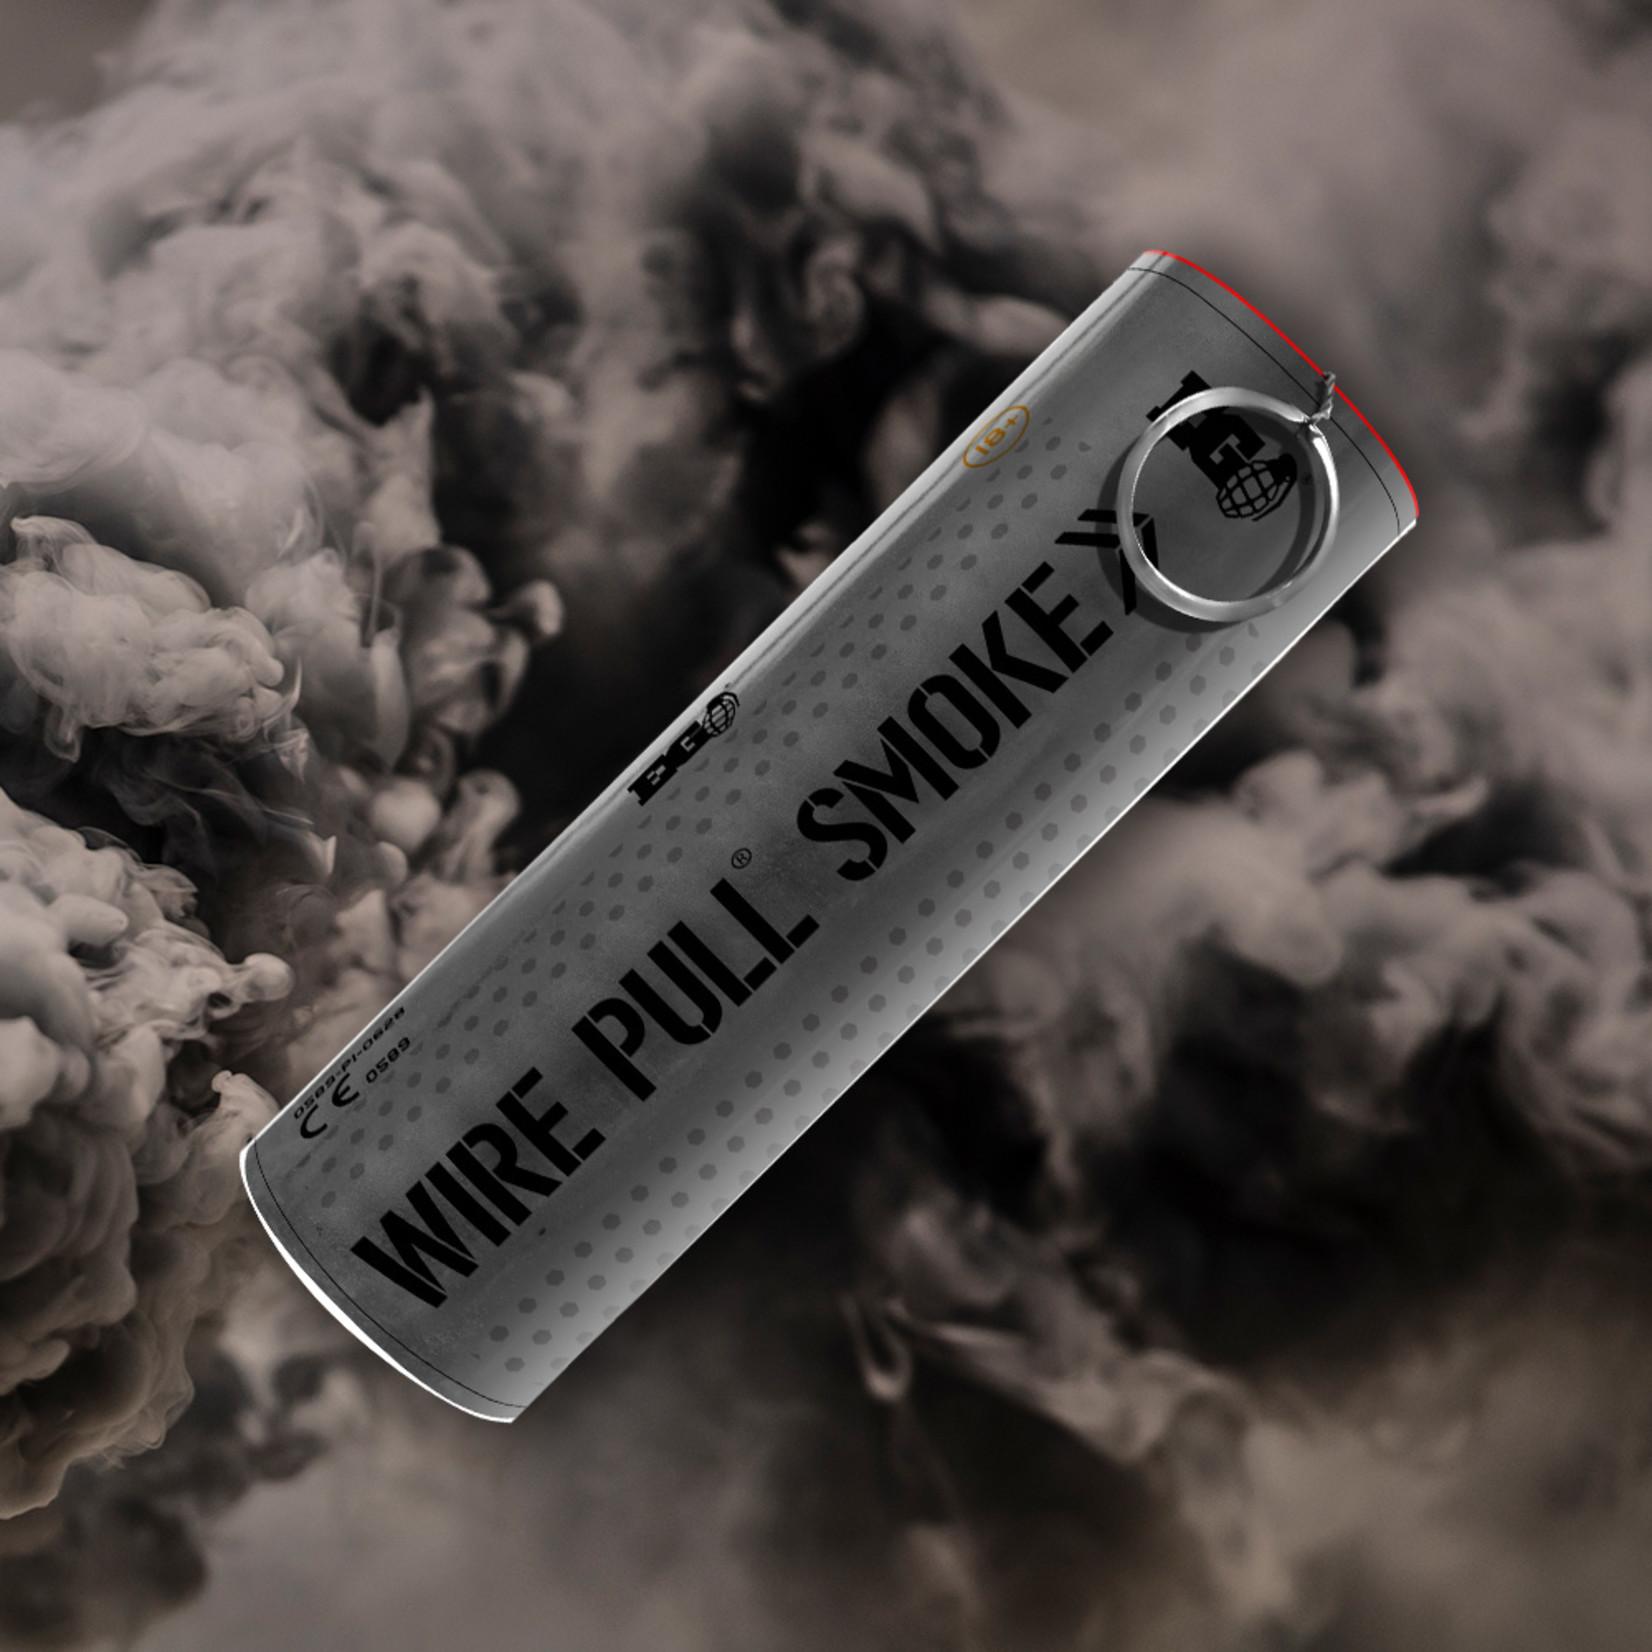 Wirepull - Black Smoke Grenade